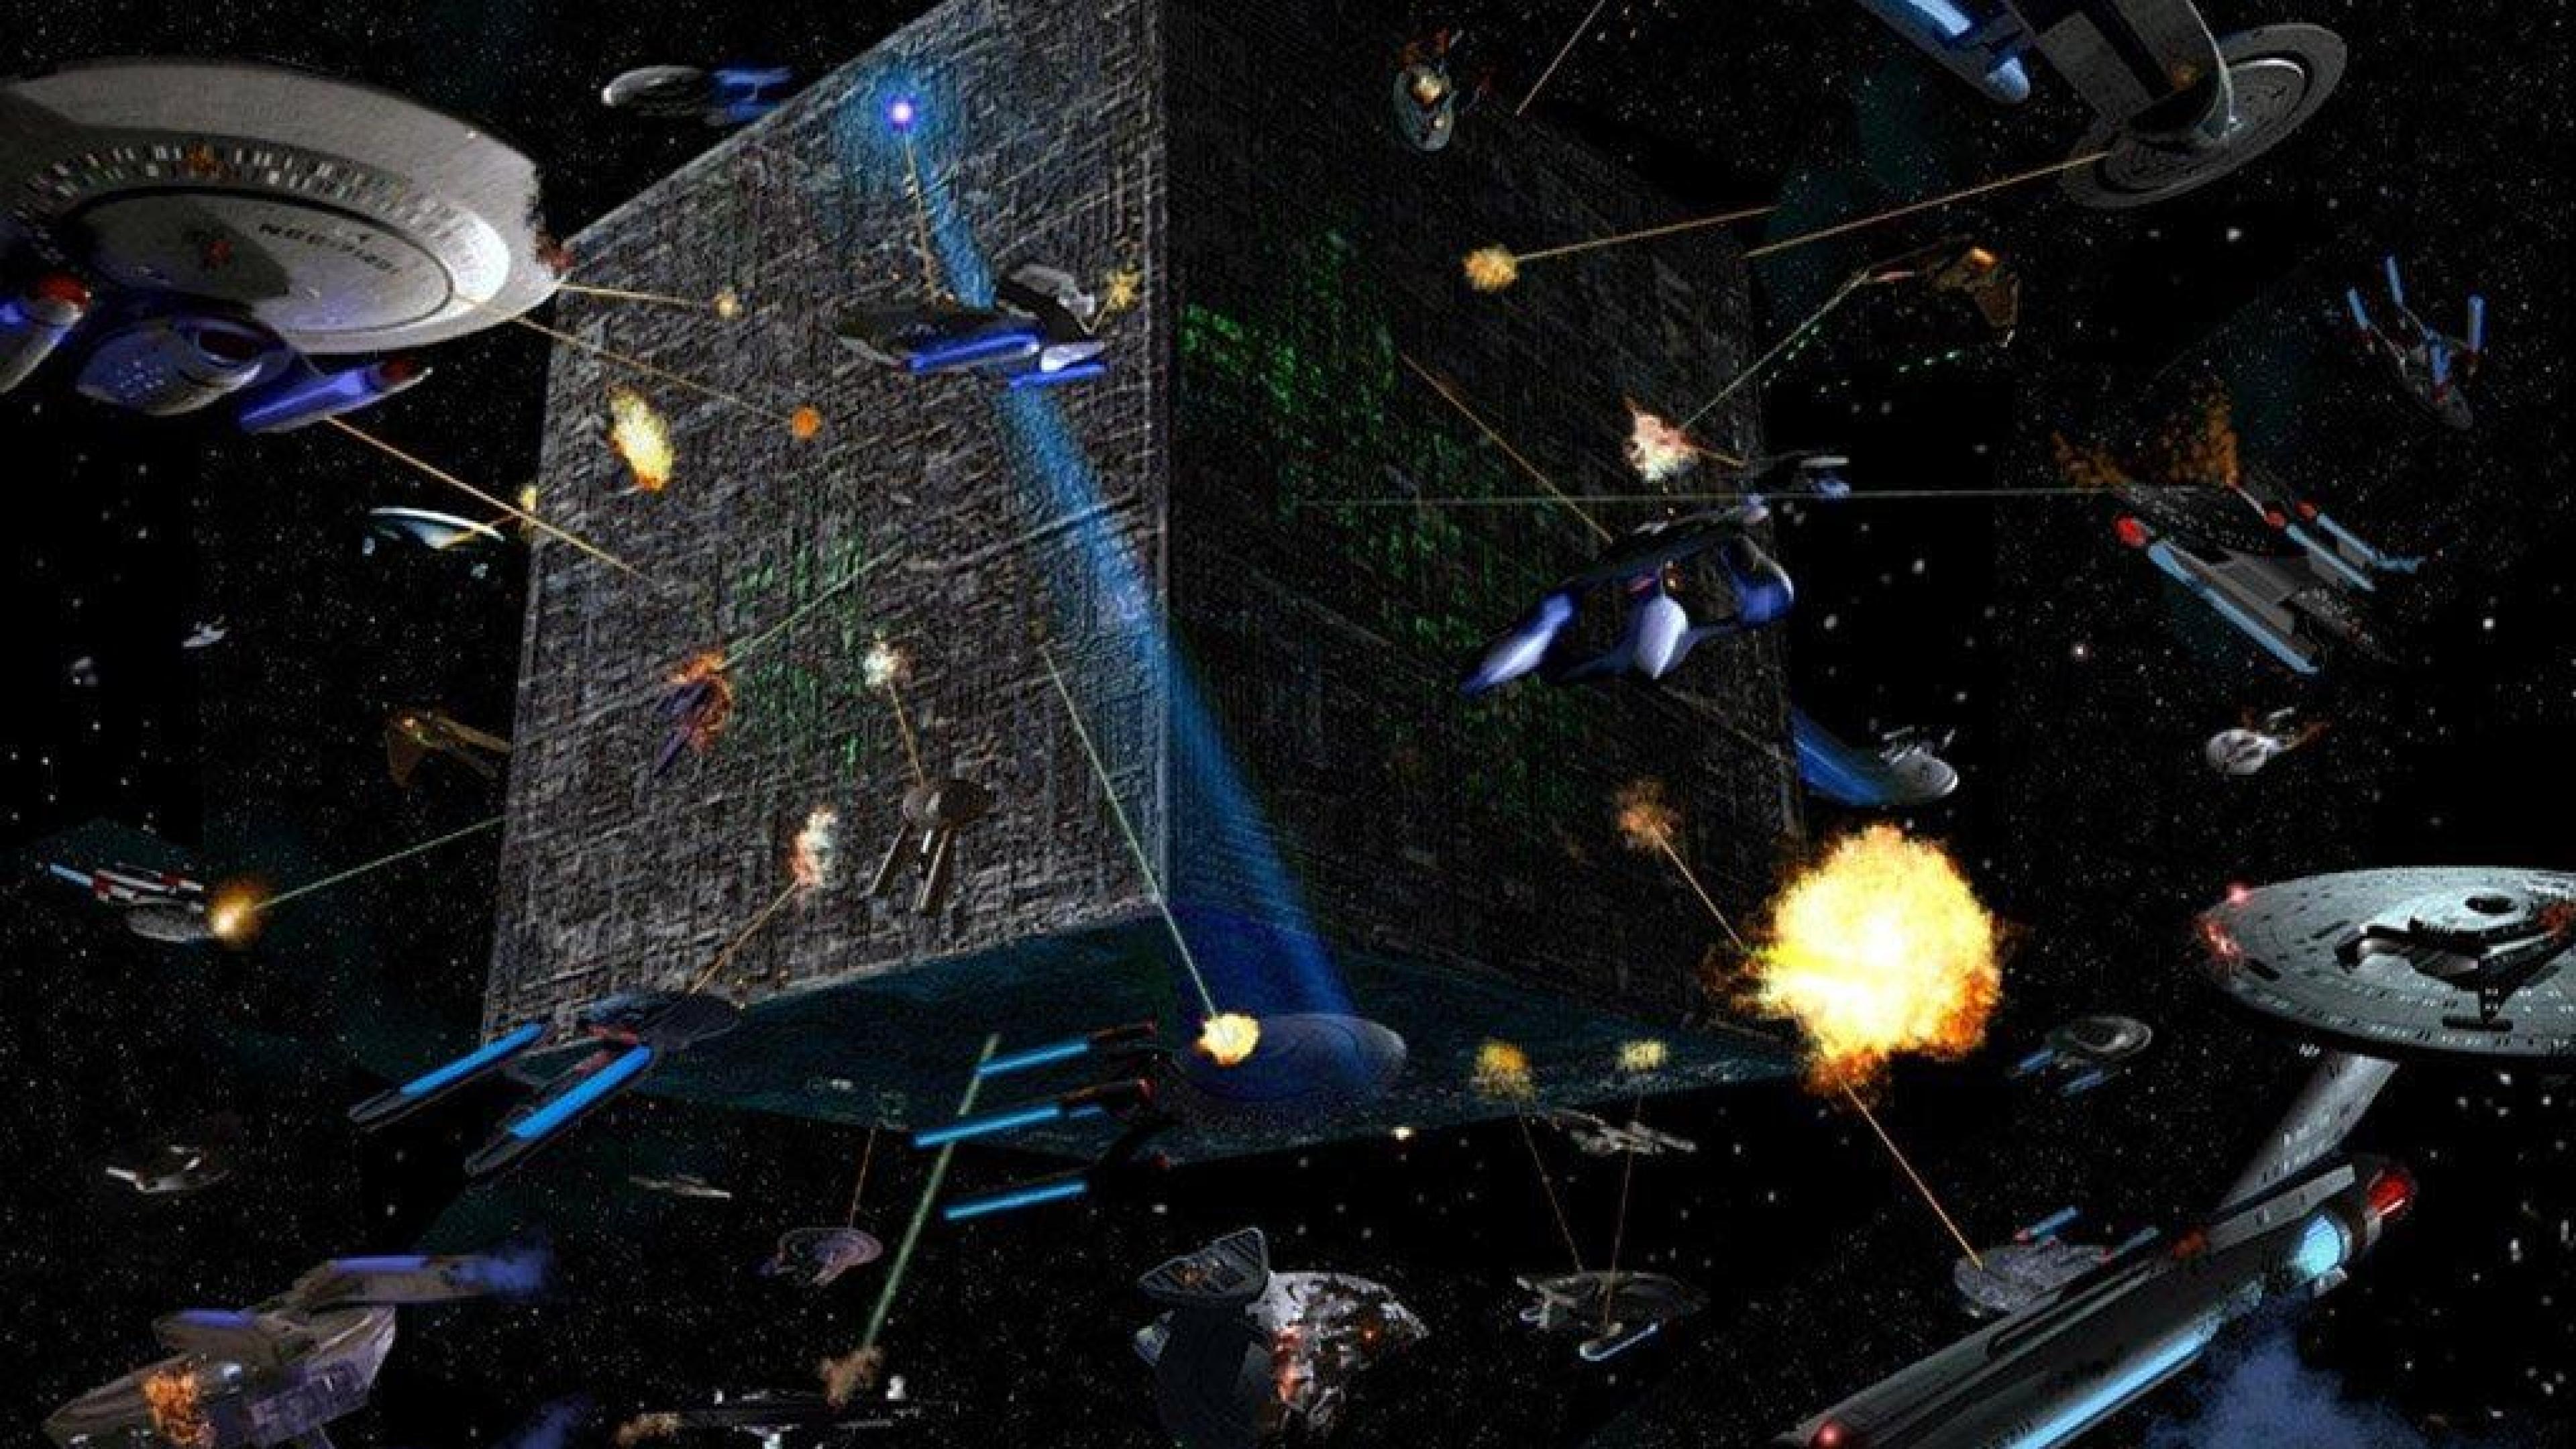 Star Trek Computer 3840 X 2160 Wallpapers Top Free Star Trek